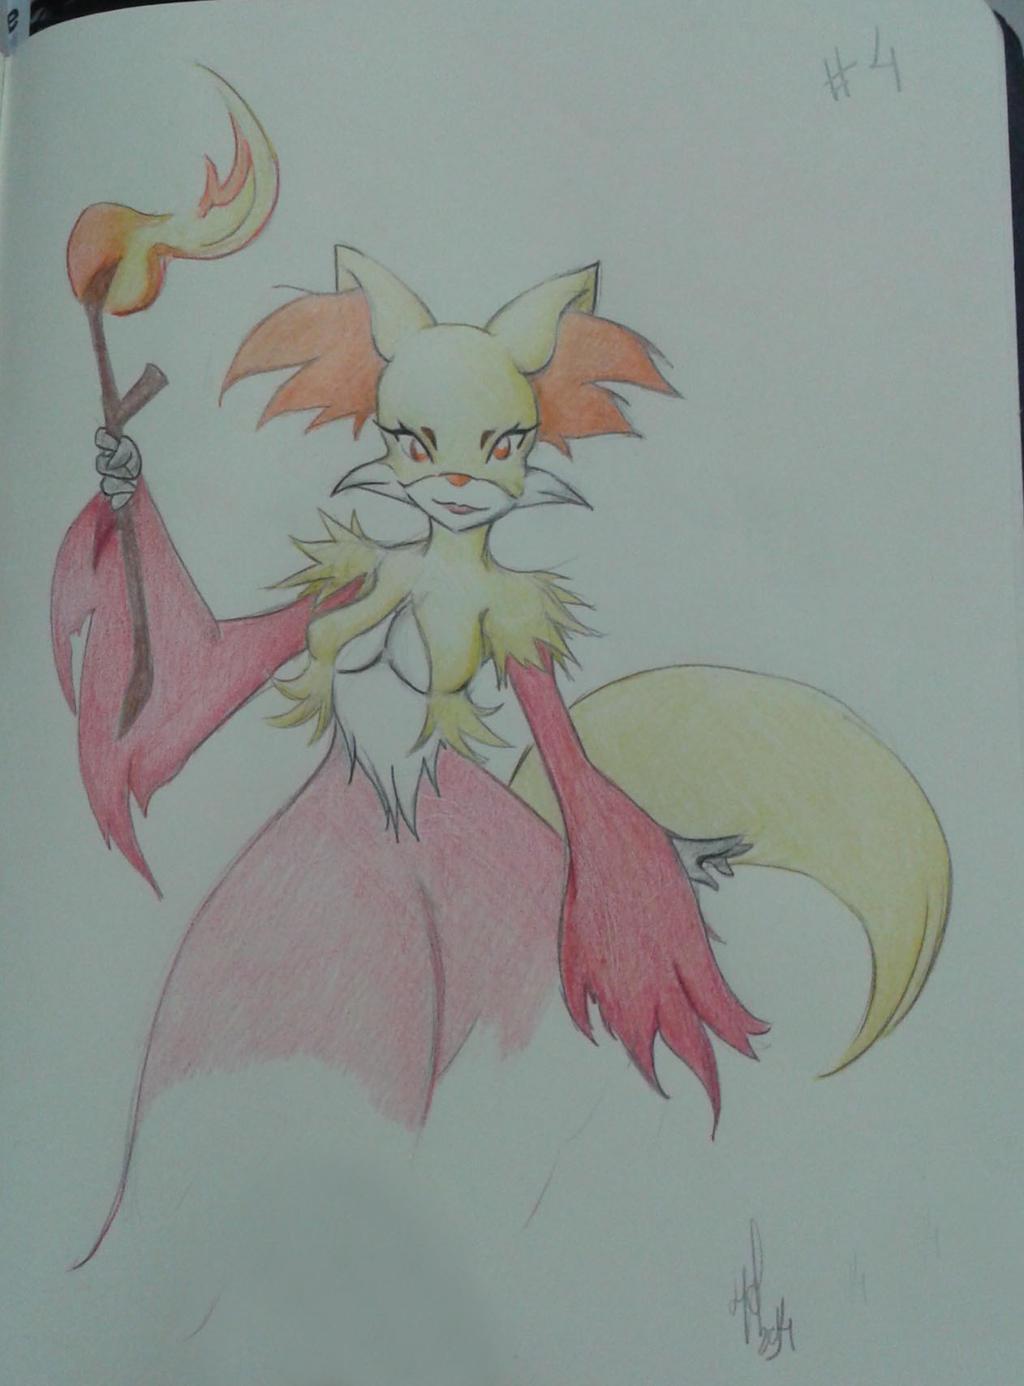 4 fav starter pokemon fire type by trovador sama on deviantart